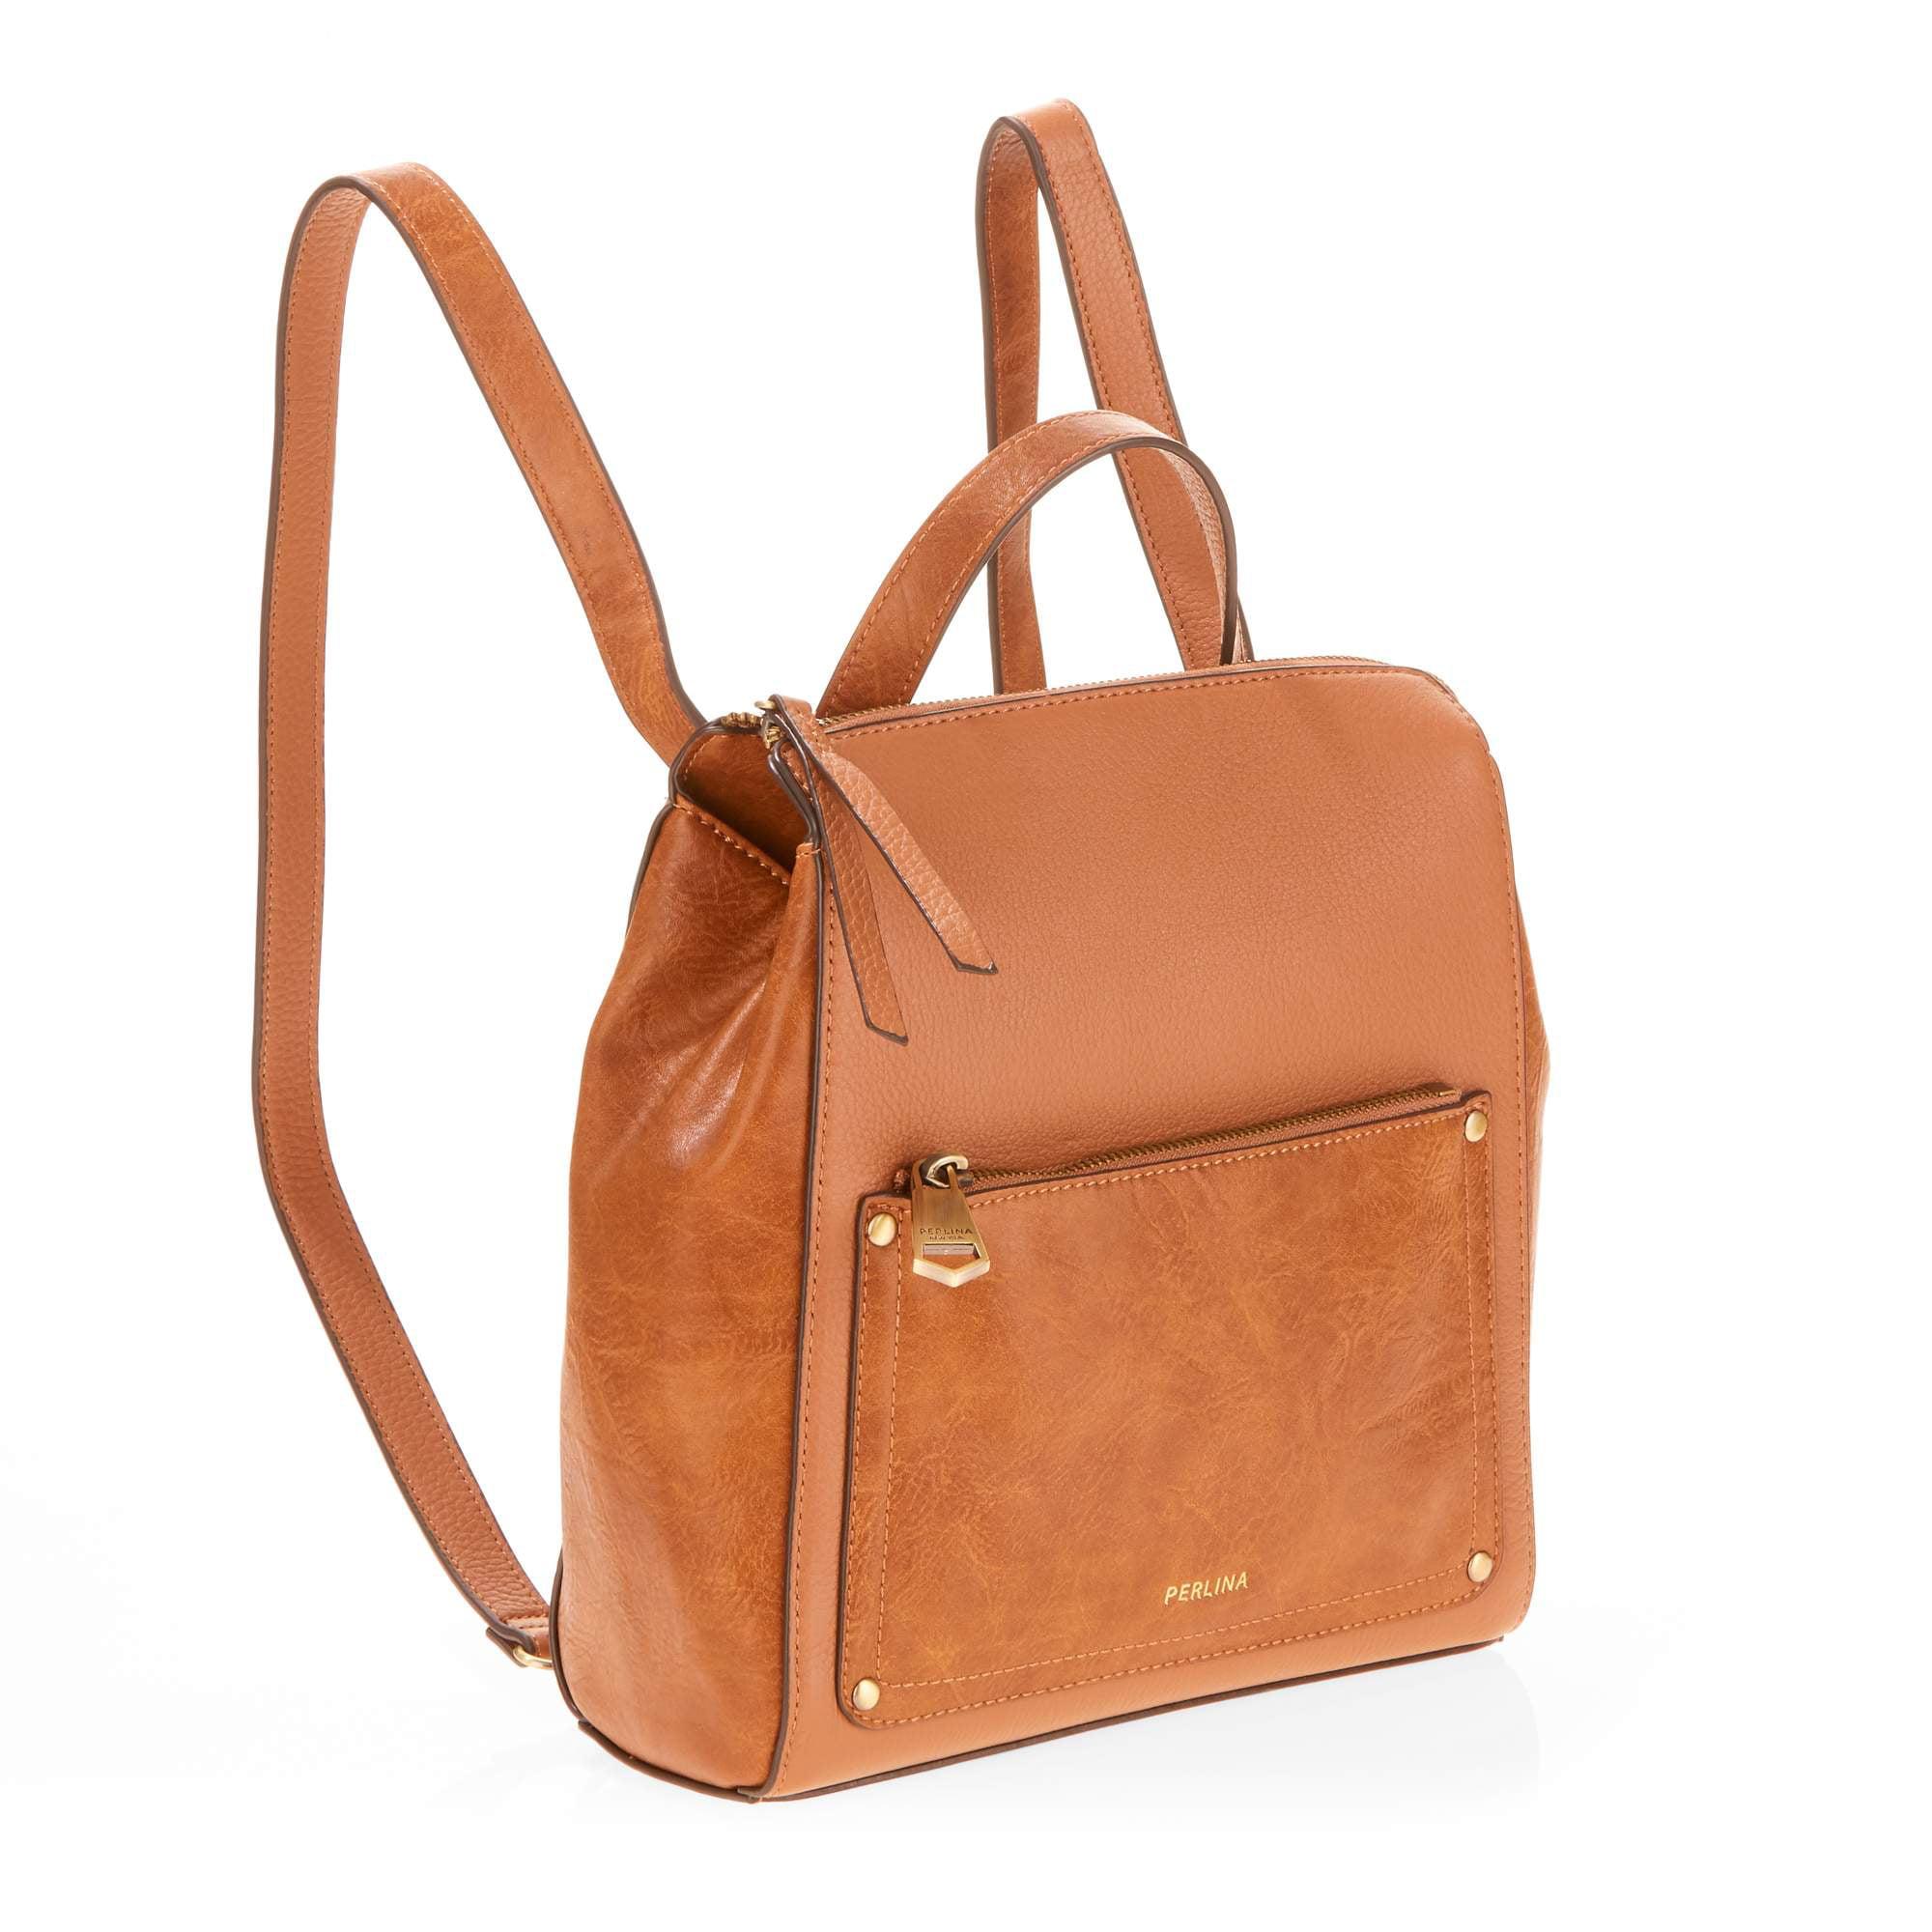 f423f5ea1ee9 Perlina - Judi Convertible Small Leather Backpack - Walmart.com